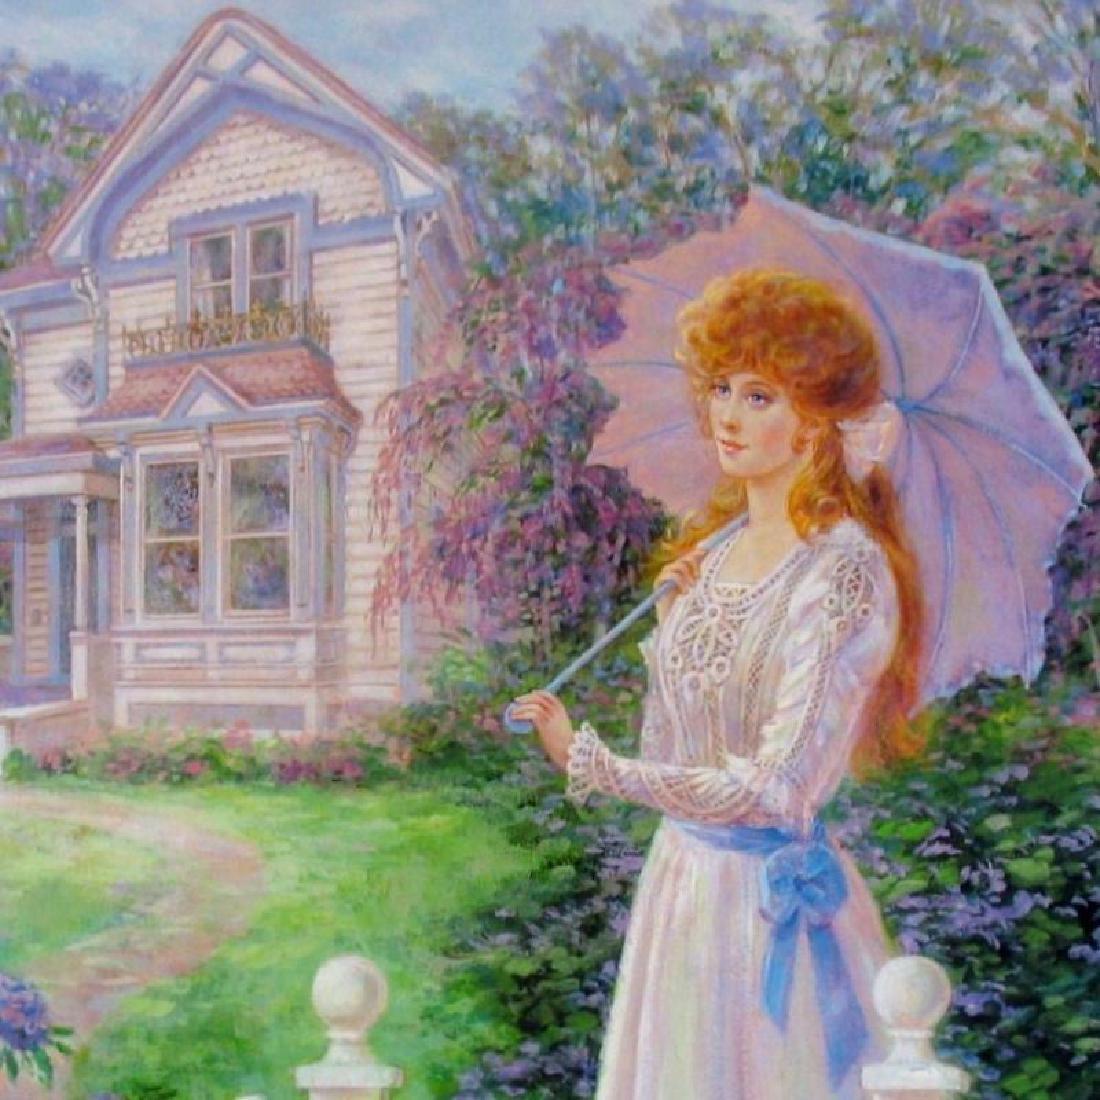 Victorian Home Impressionism Colorful Ltd Ed Sale - 2